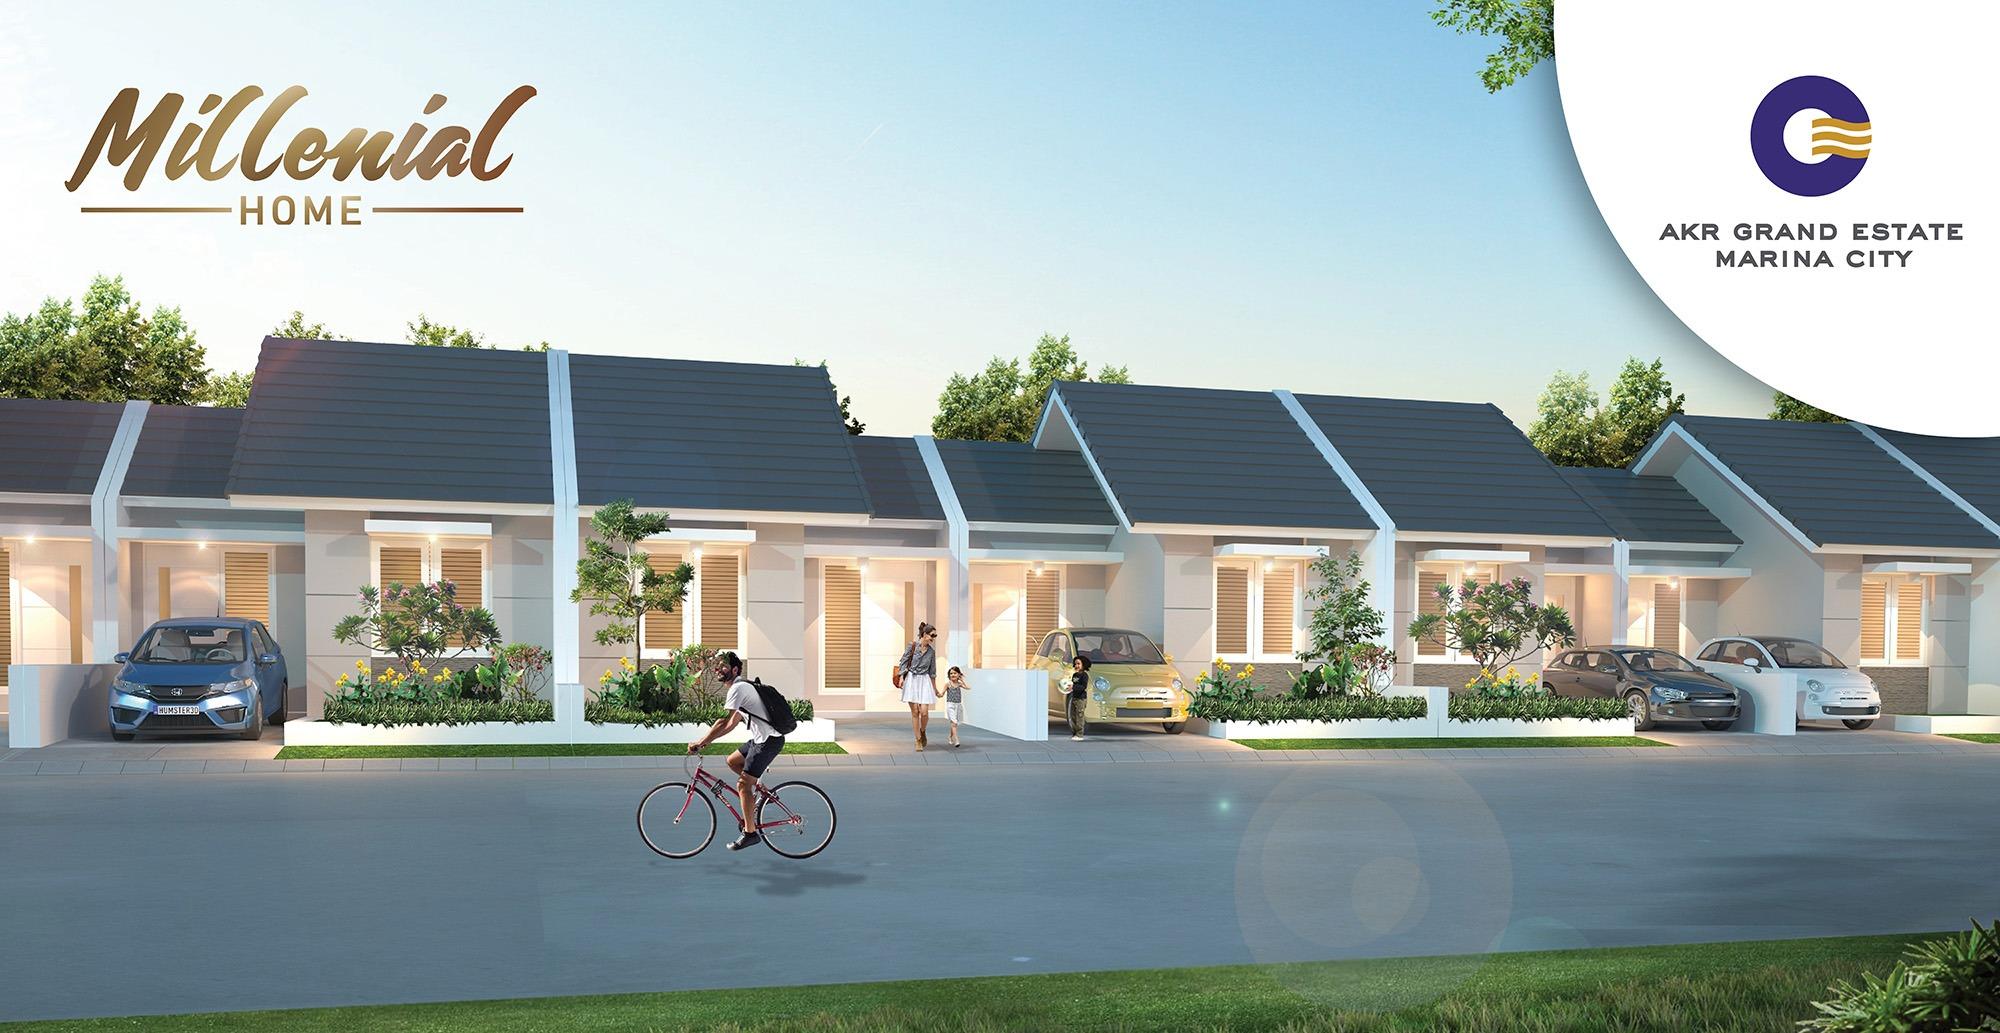 Millenial Home berada di Cluster Garnet Place